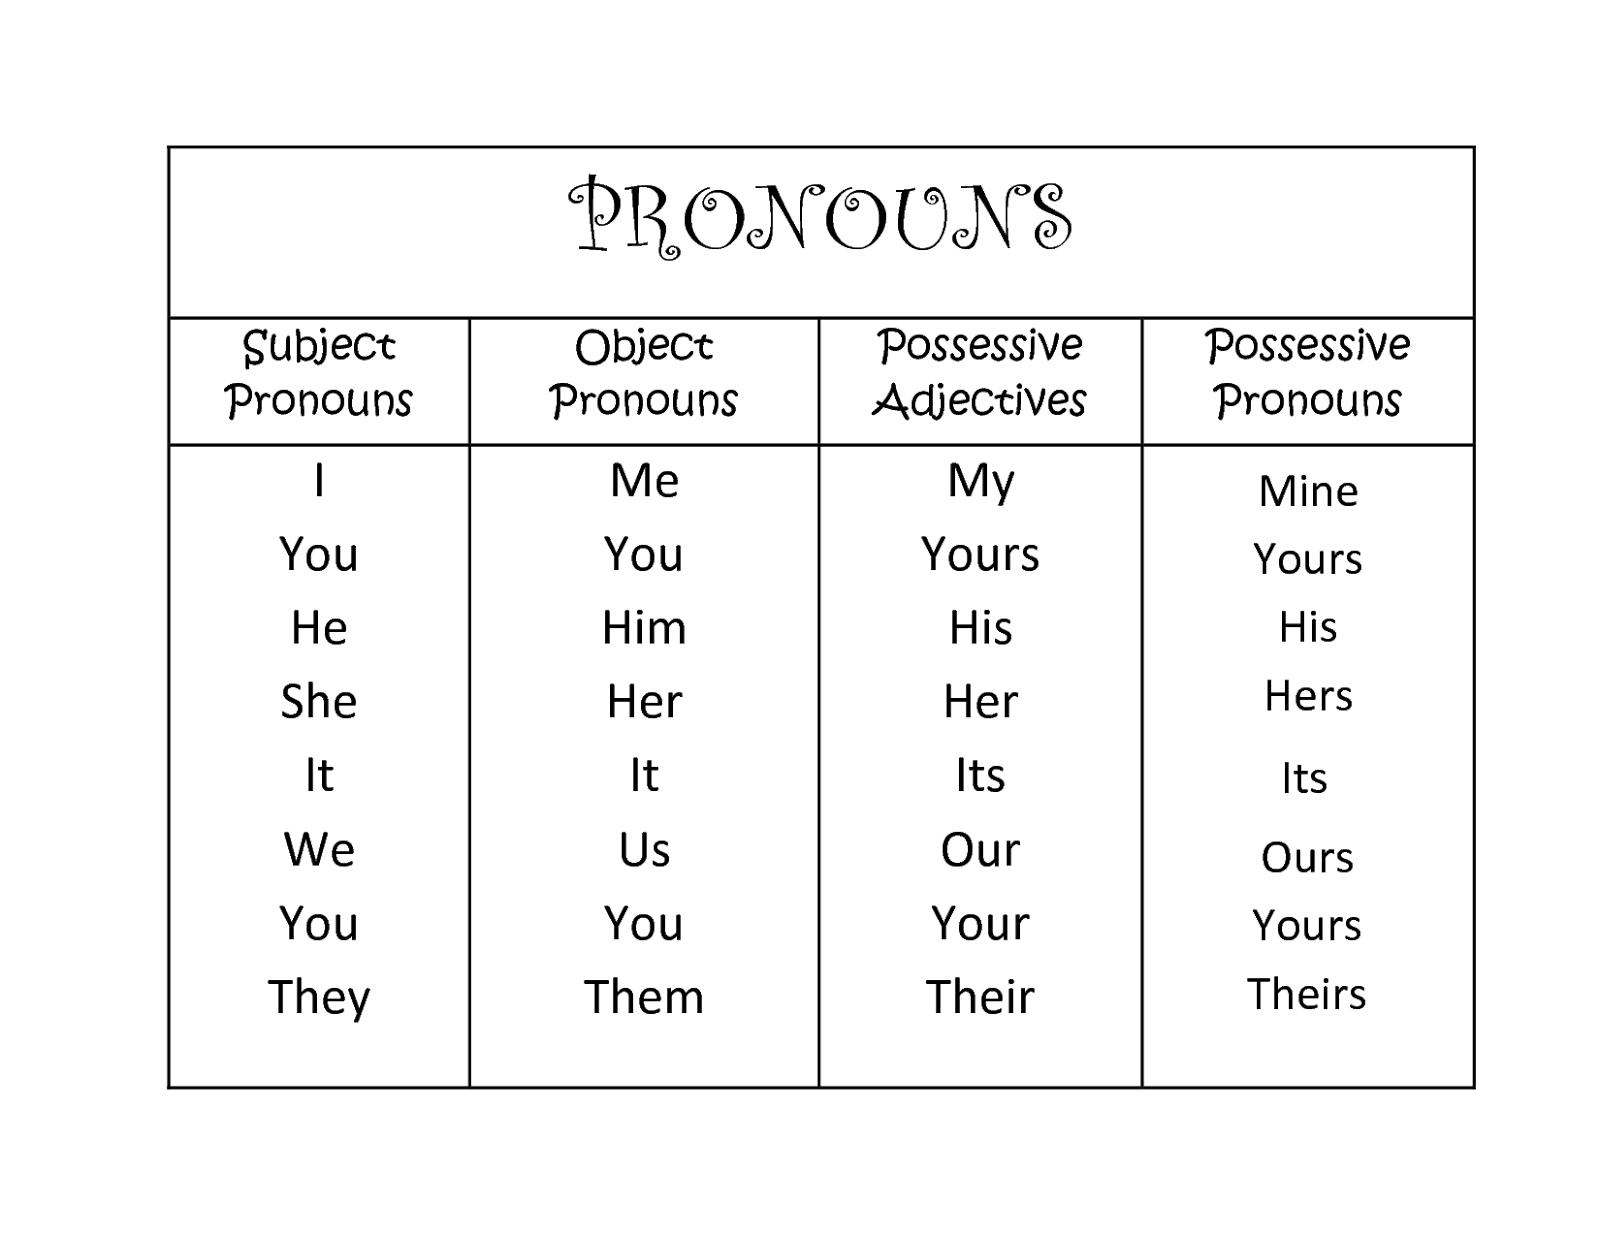 English pronoun